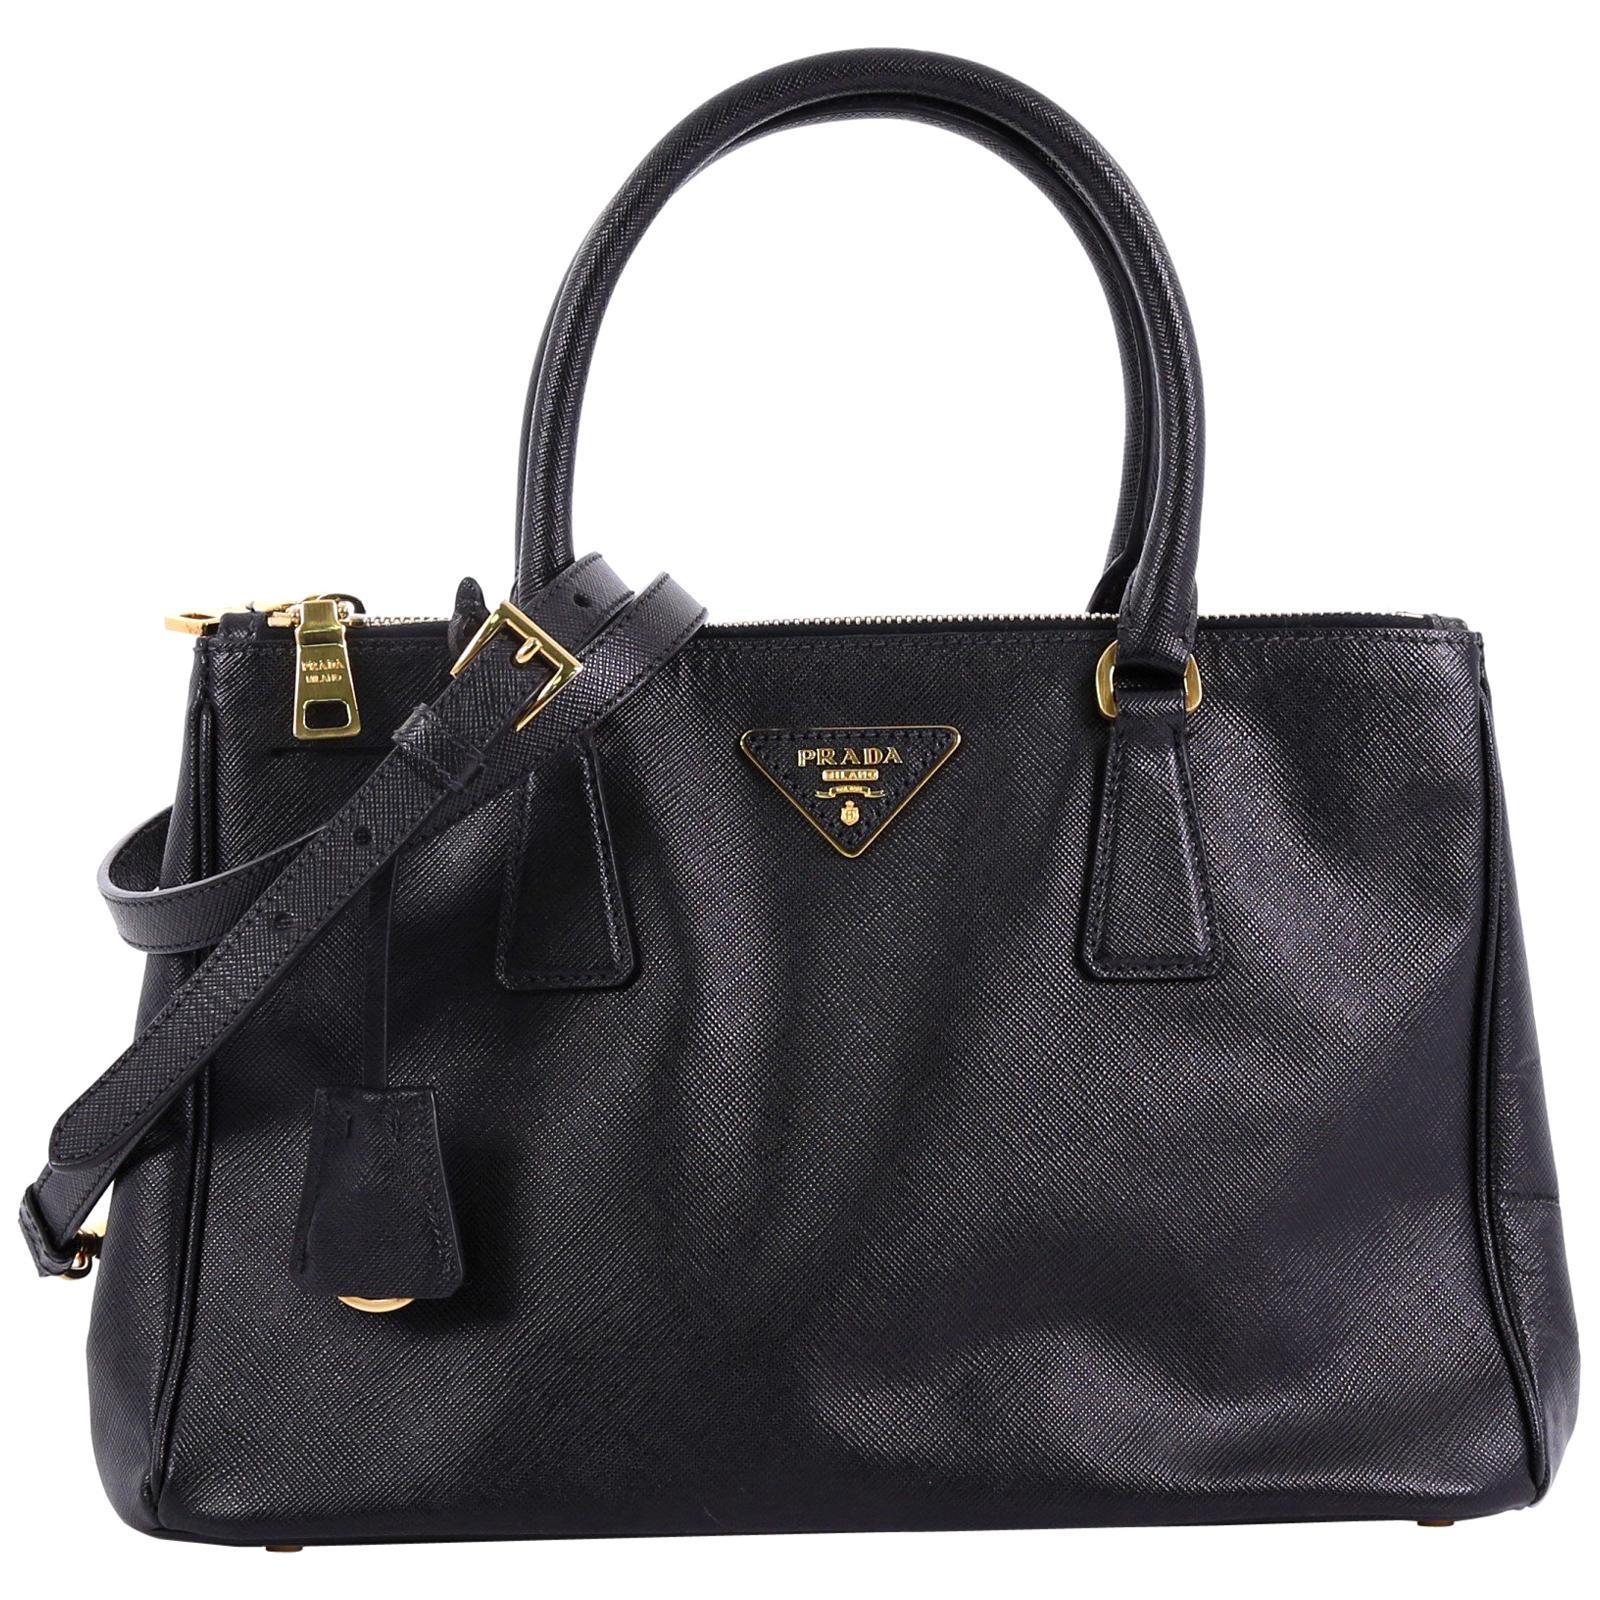 73a910e3976 Vintage Prada Handbags and Purses - 1,006 For Sale at 1stdibs